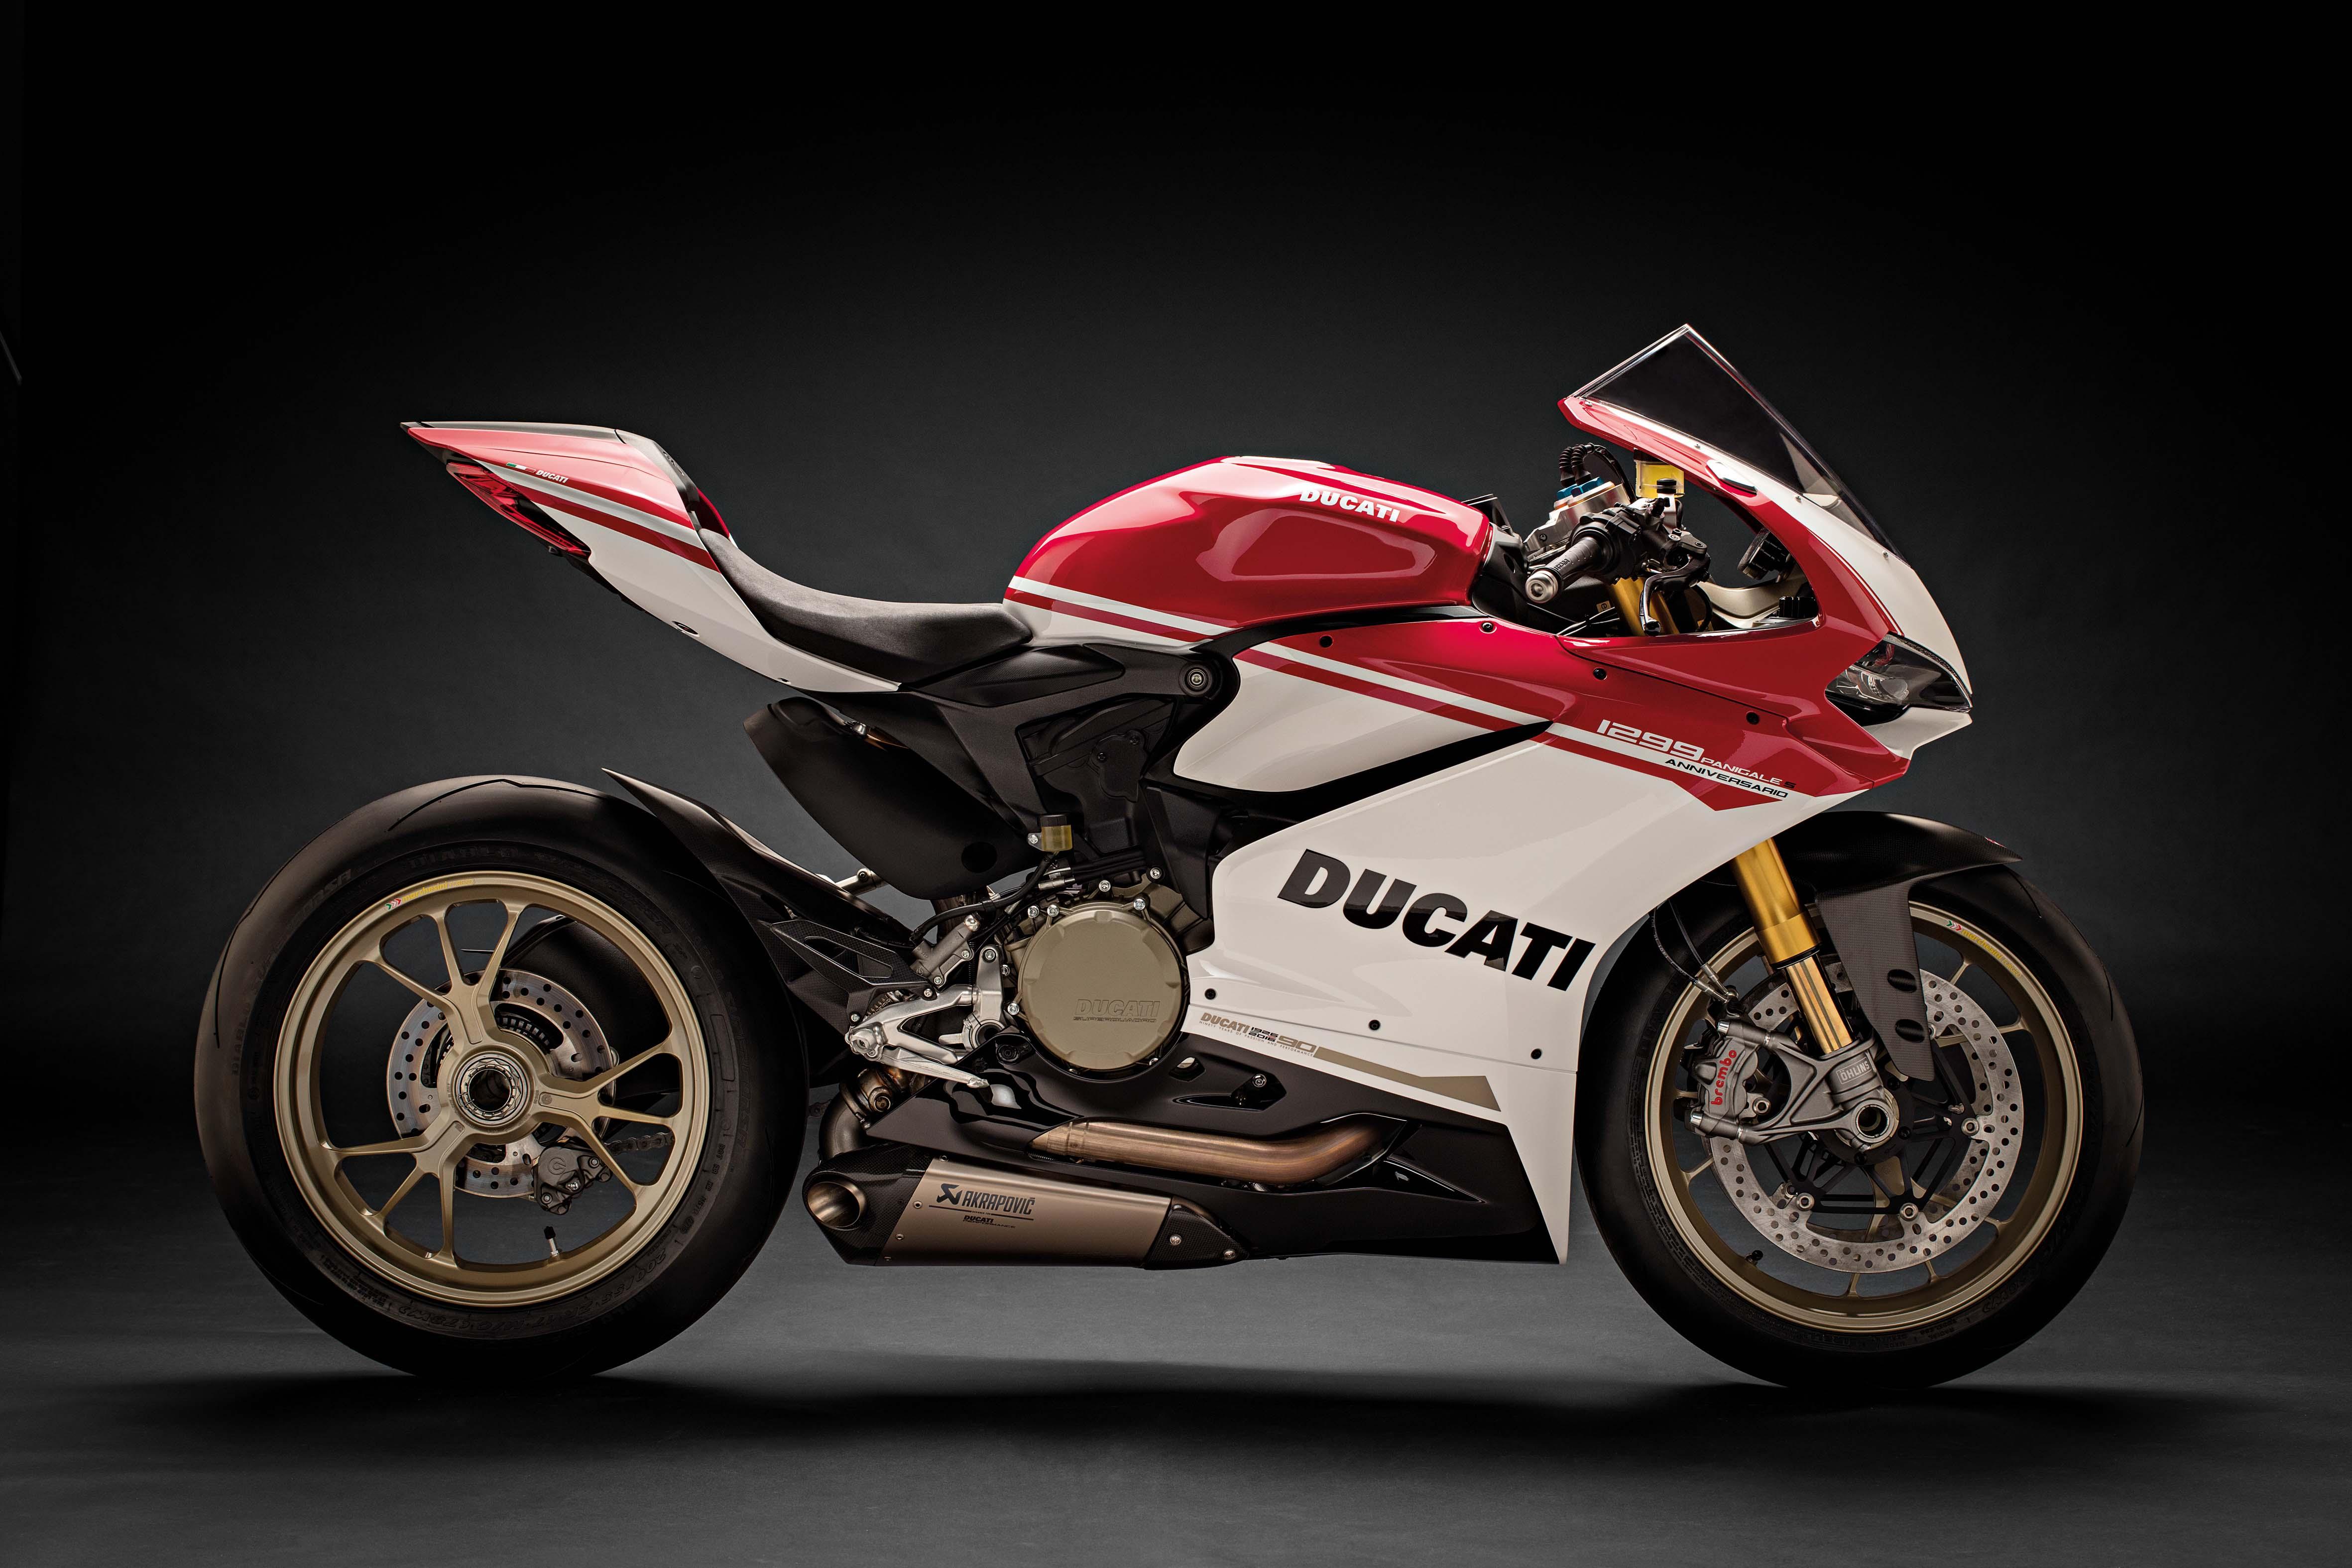 Ducati Panigale 1200cc >> Ducati 1299 Panigale S Anniversario Celebrating 90 Years